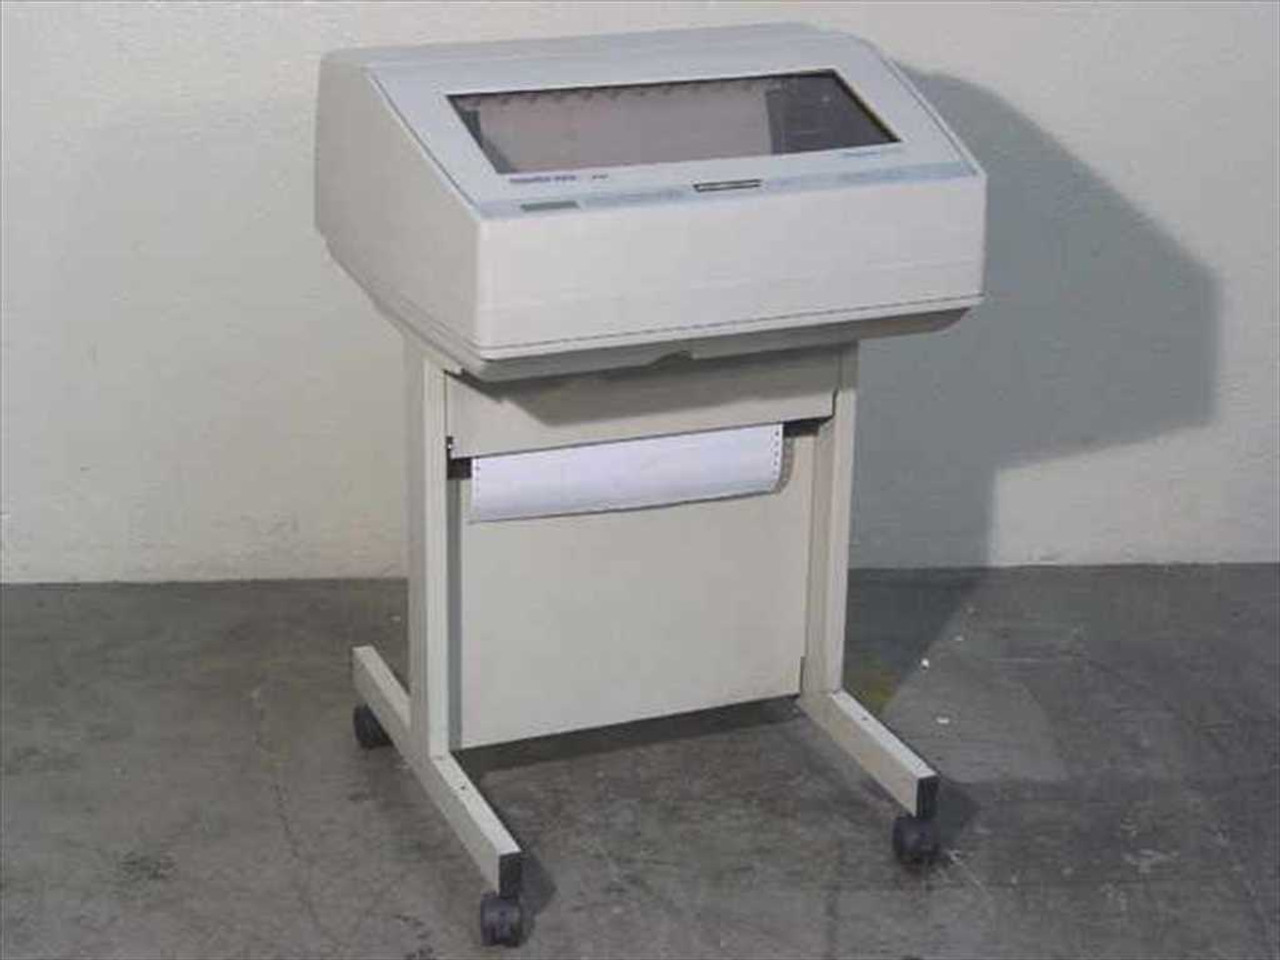 printronix-p5008-800-lpm-proline-series-5-line-matrix-printer-1.35__97003.1490181342.jpg